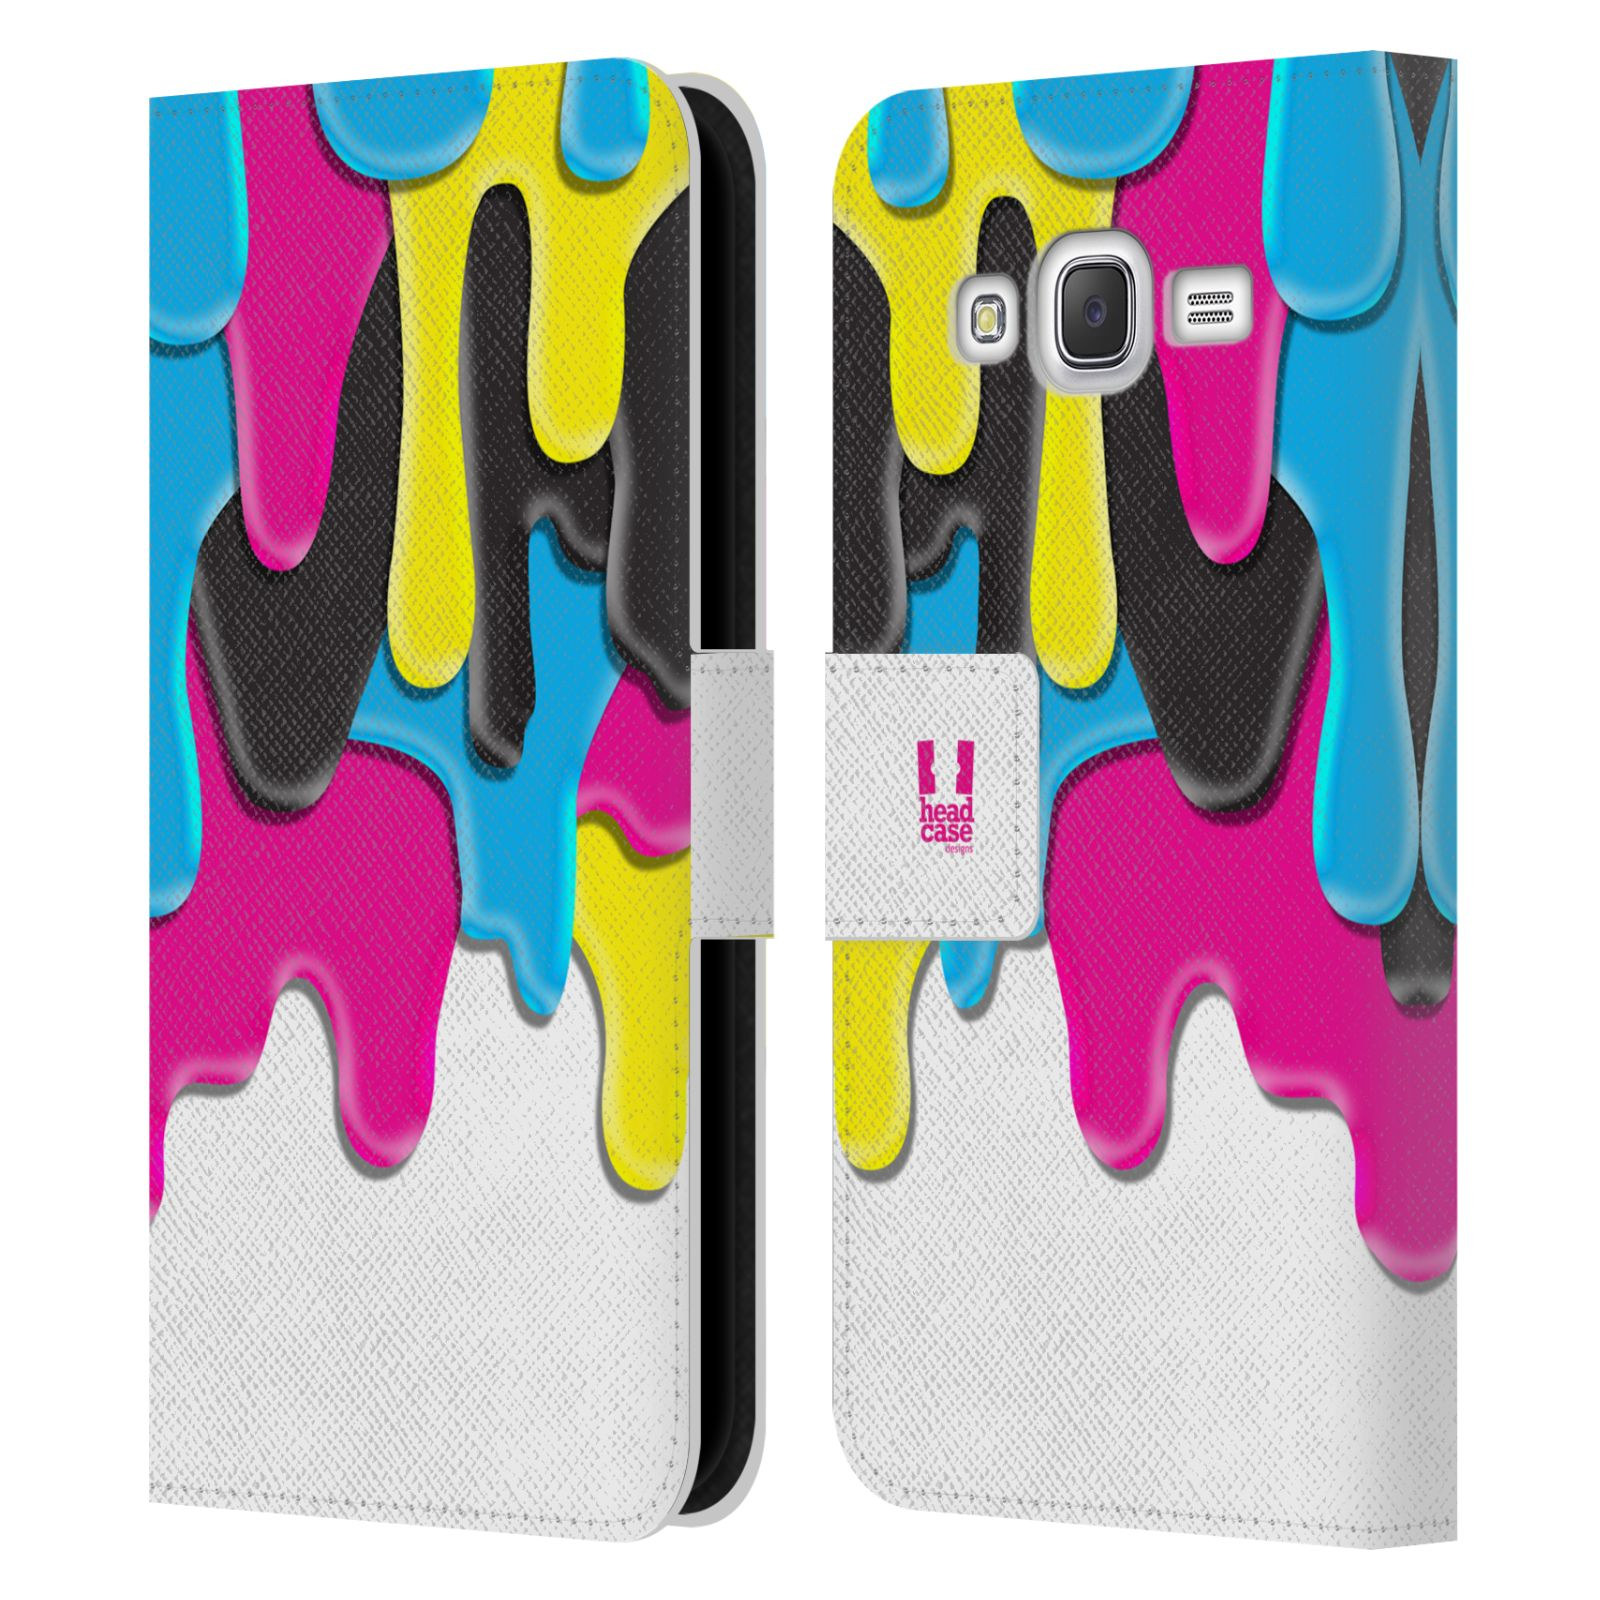 HEAD CASE Flipové pouzdro pro mobil Samsung Galaxy J5 (J500) / J5 DUOS ZÁPLAVA BARVA MIX barev